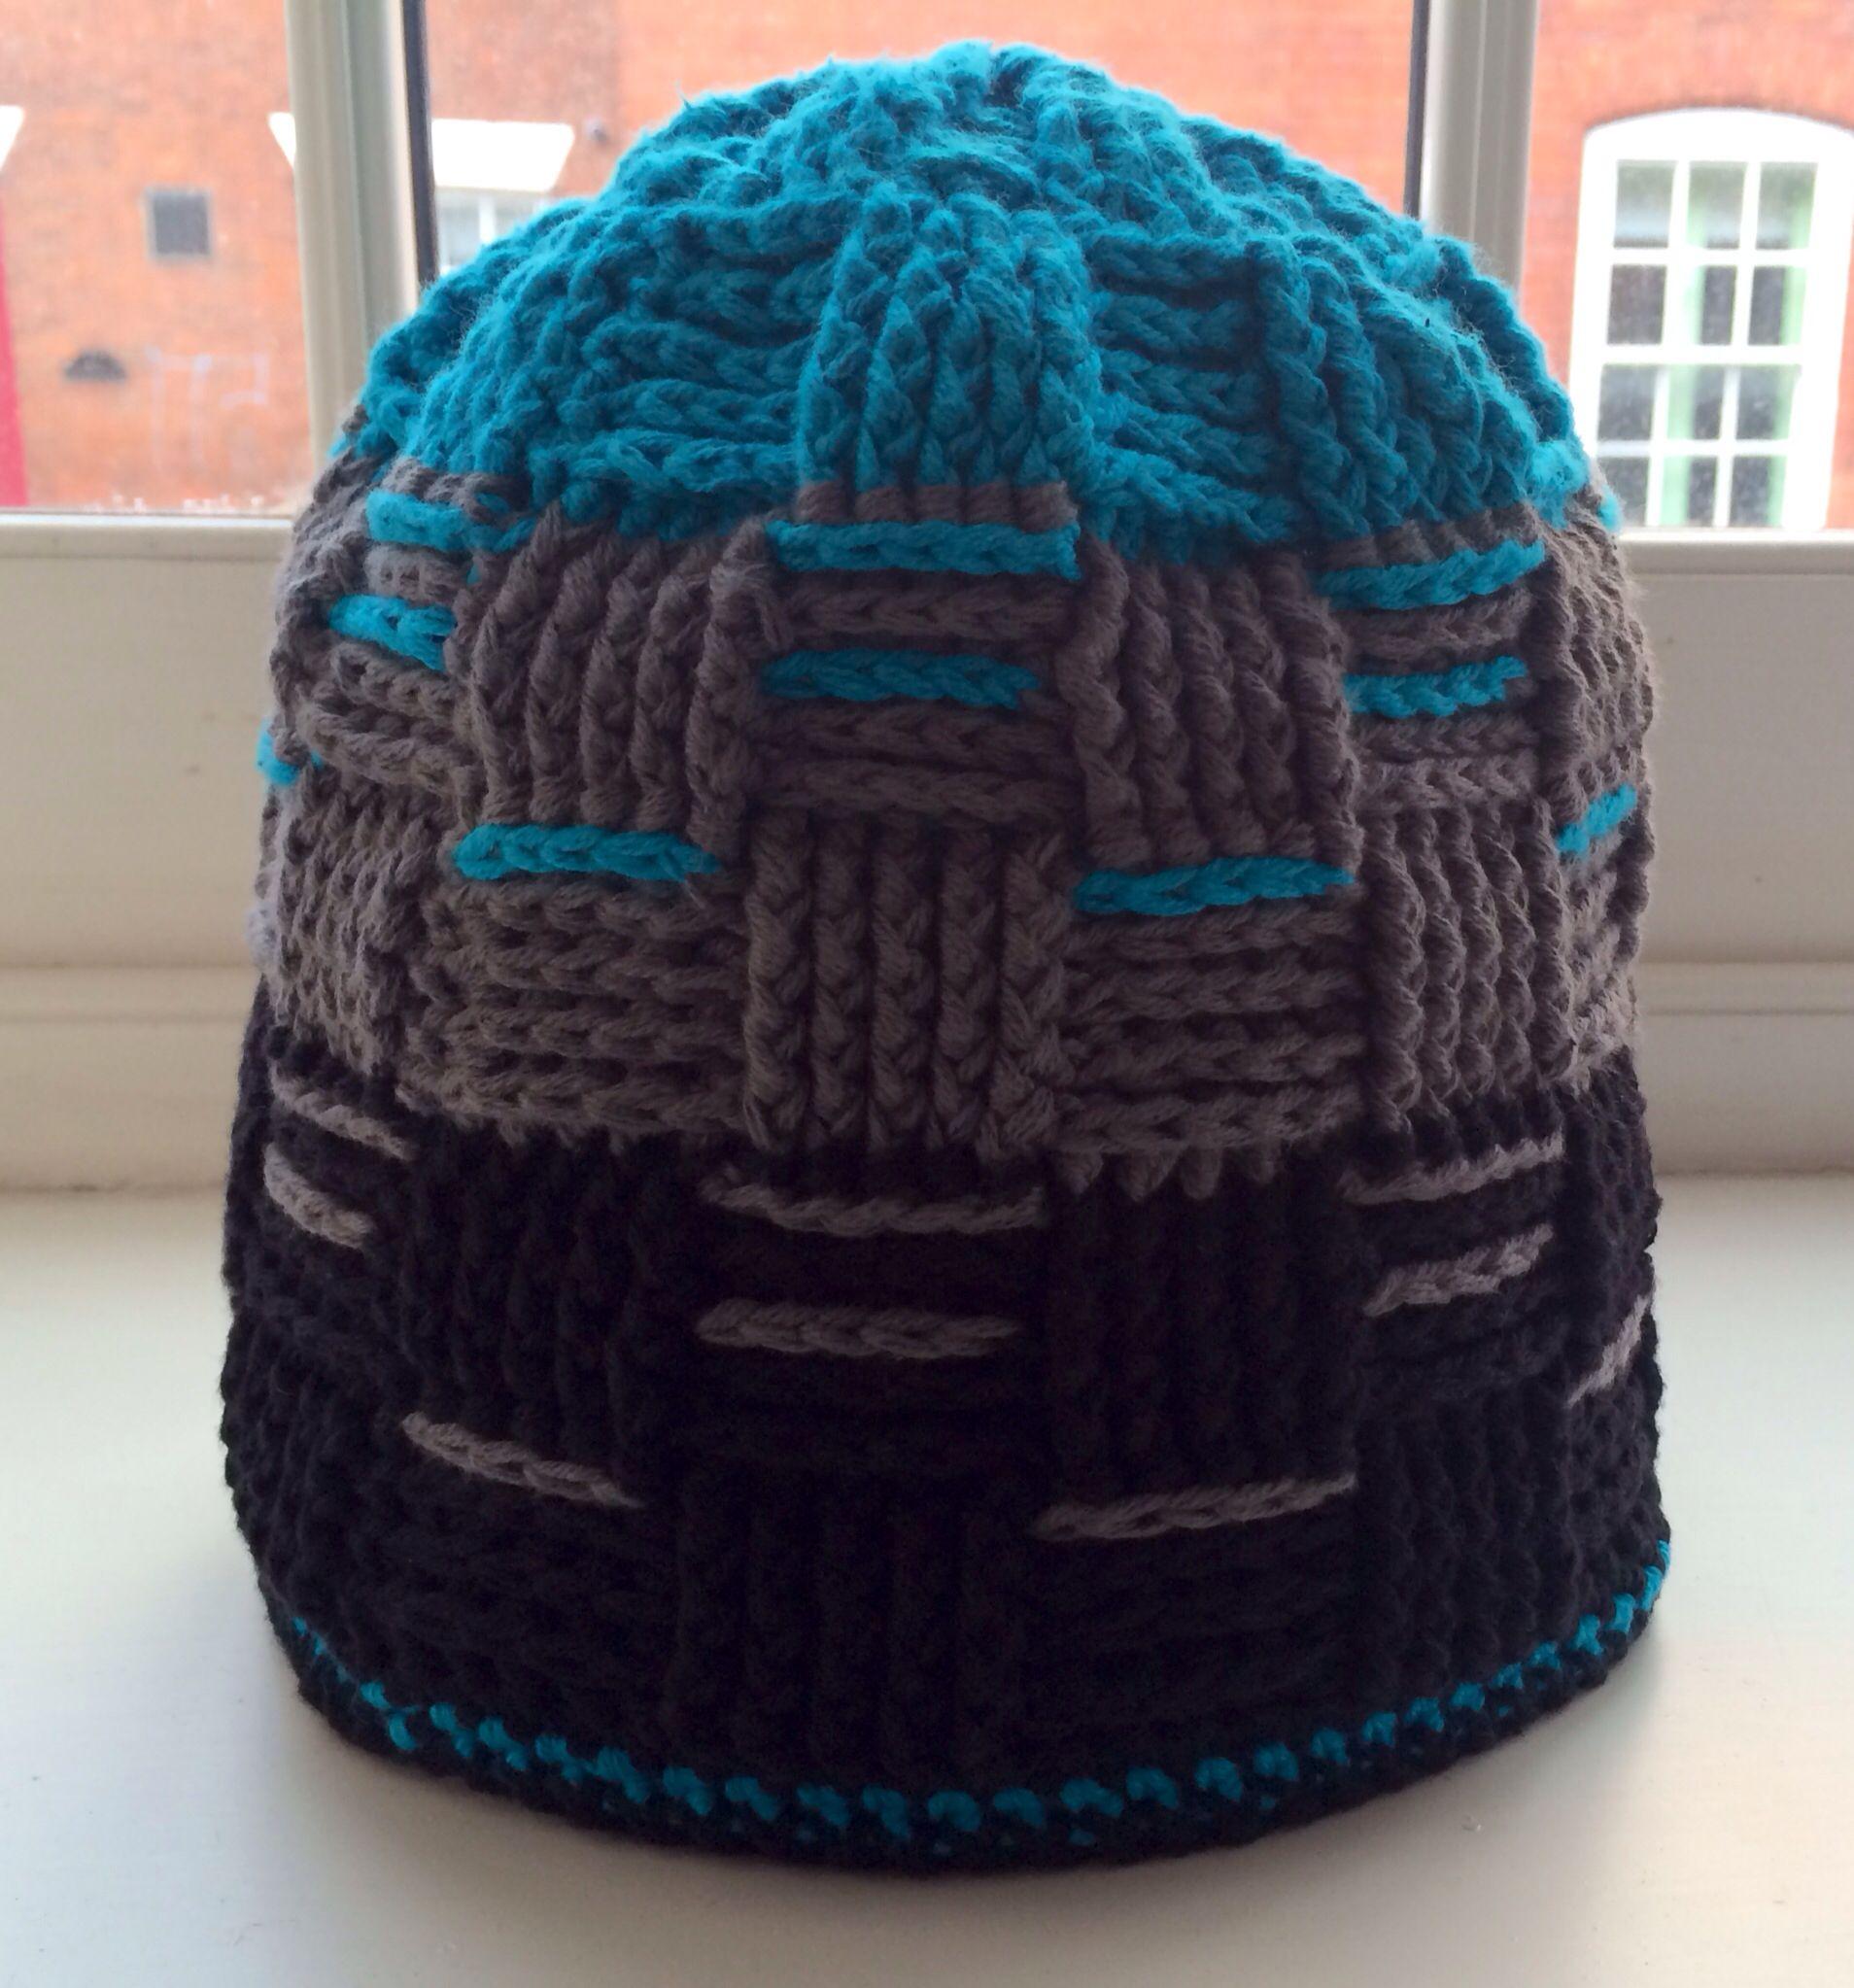 Mütze mit Korbmuster aus myBoshi No2 | Häkeln/Crochet | Pinterest ...